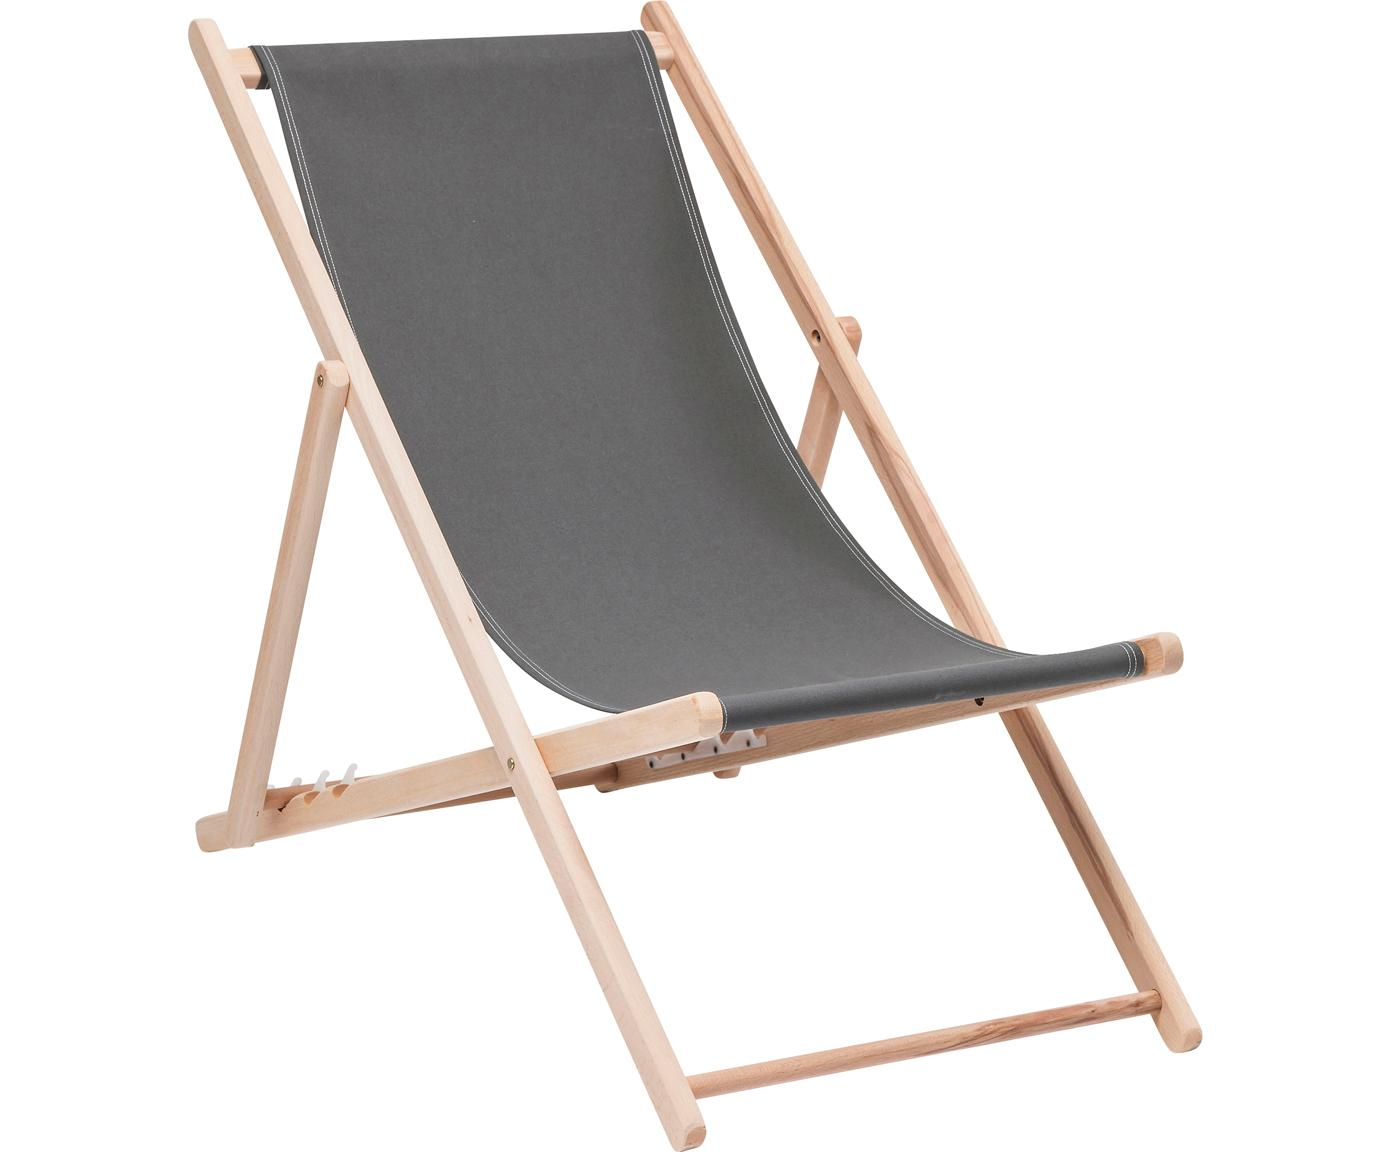 Tumbona plegable Hot Summer, Estructura: madera de haya, Gris, madera de haya, An 96 x F 56 cm